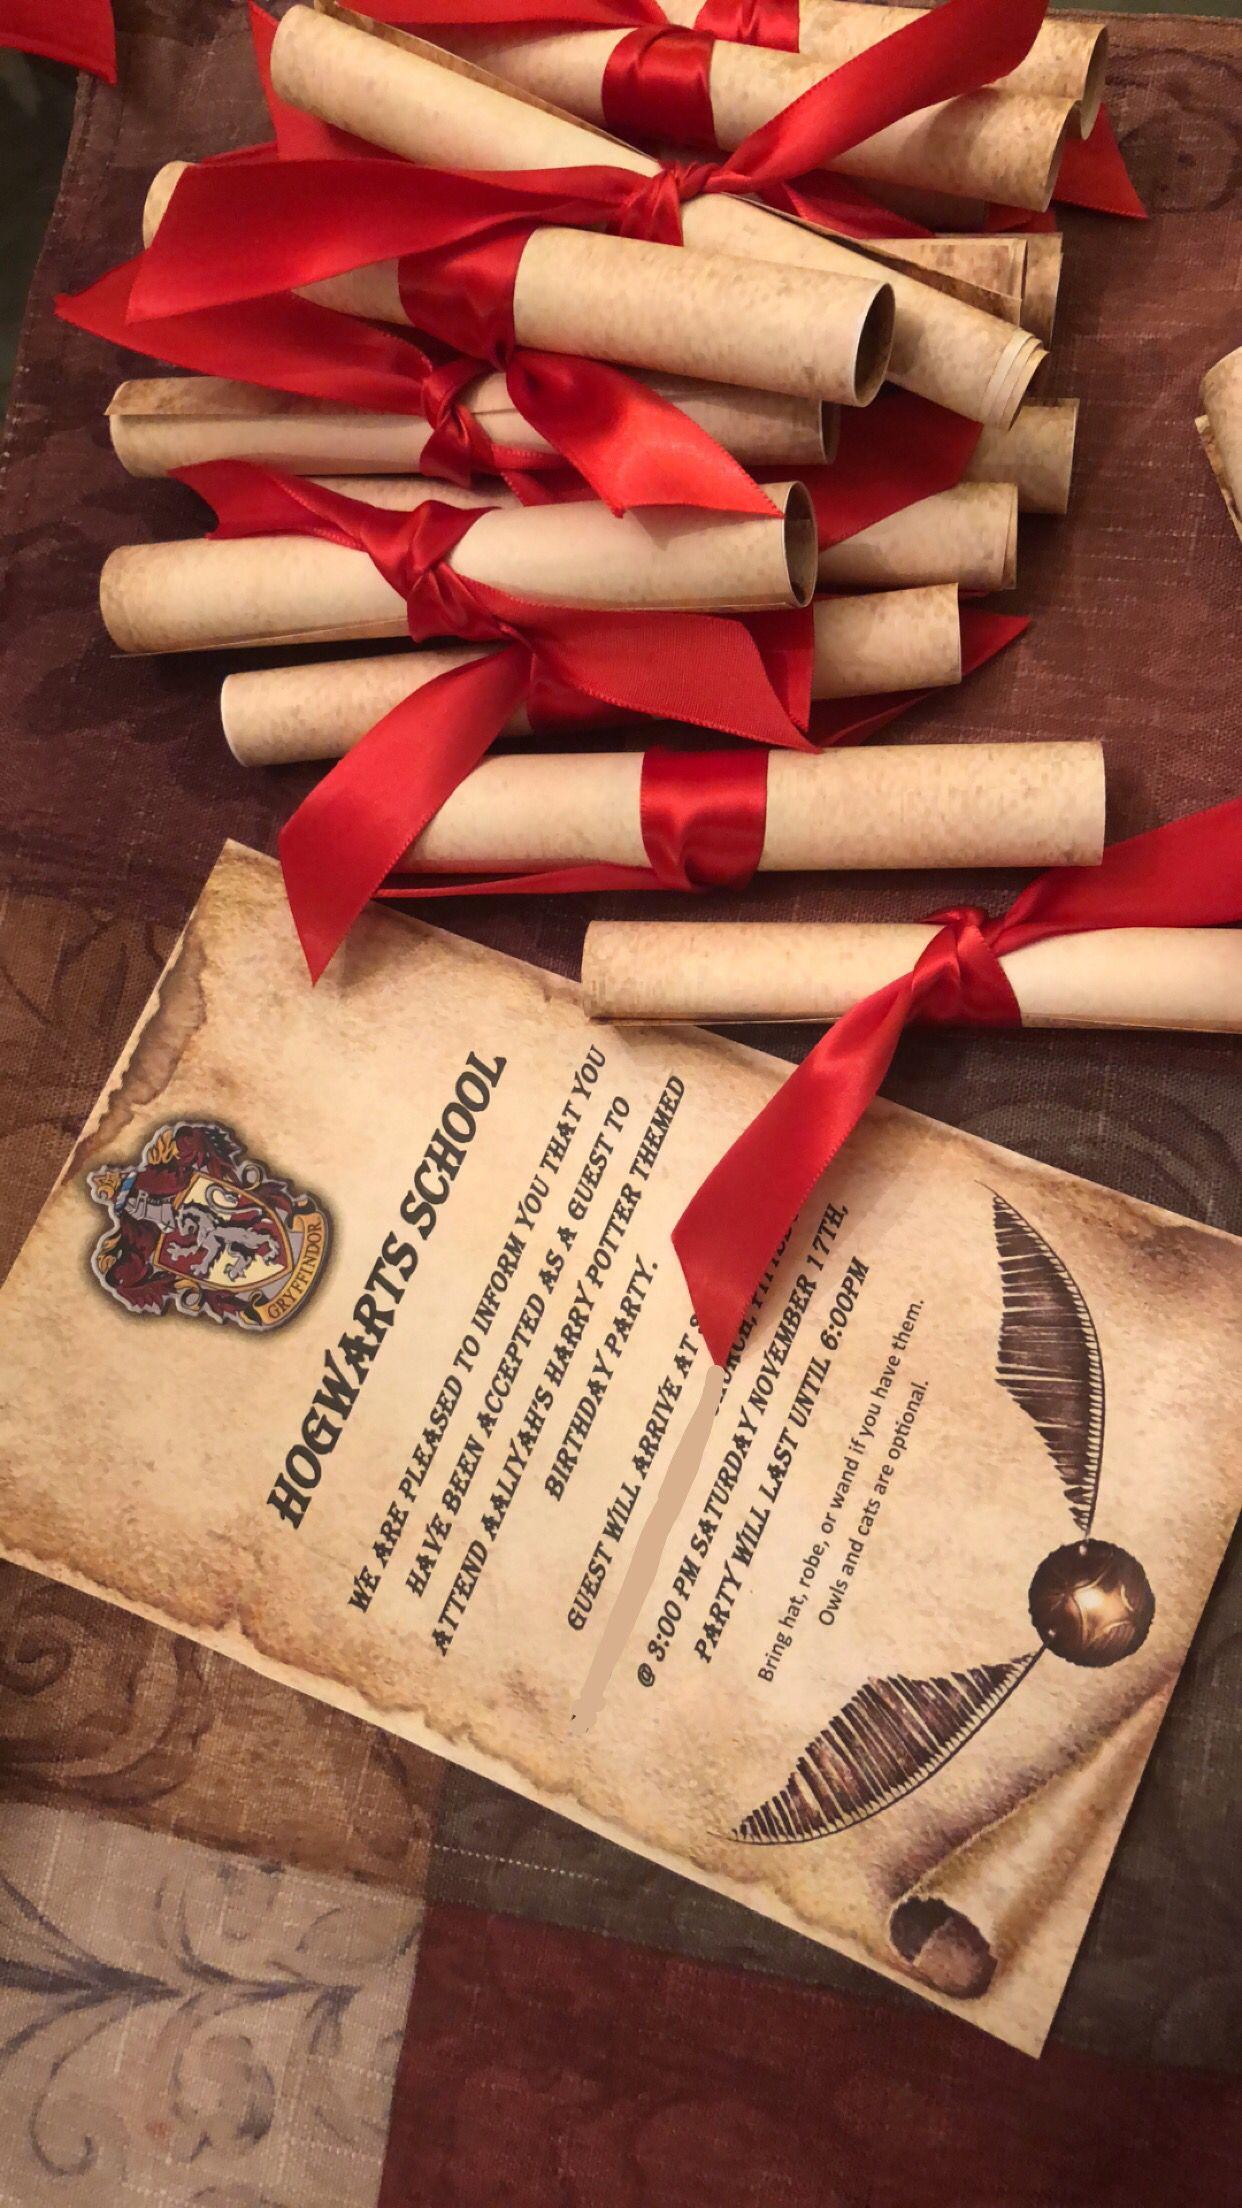 Harry Potter Invitations Harry Potter Theme Birthday Harry Potter Theme Birthday Party Harry Potter Birthday Invitations